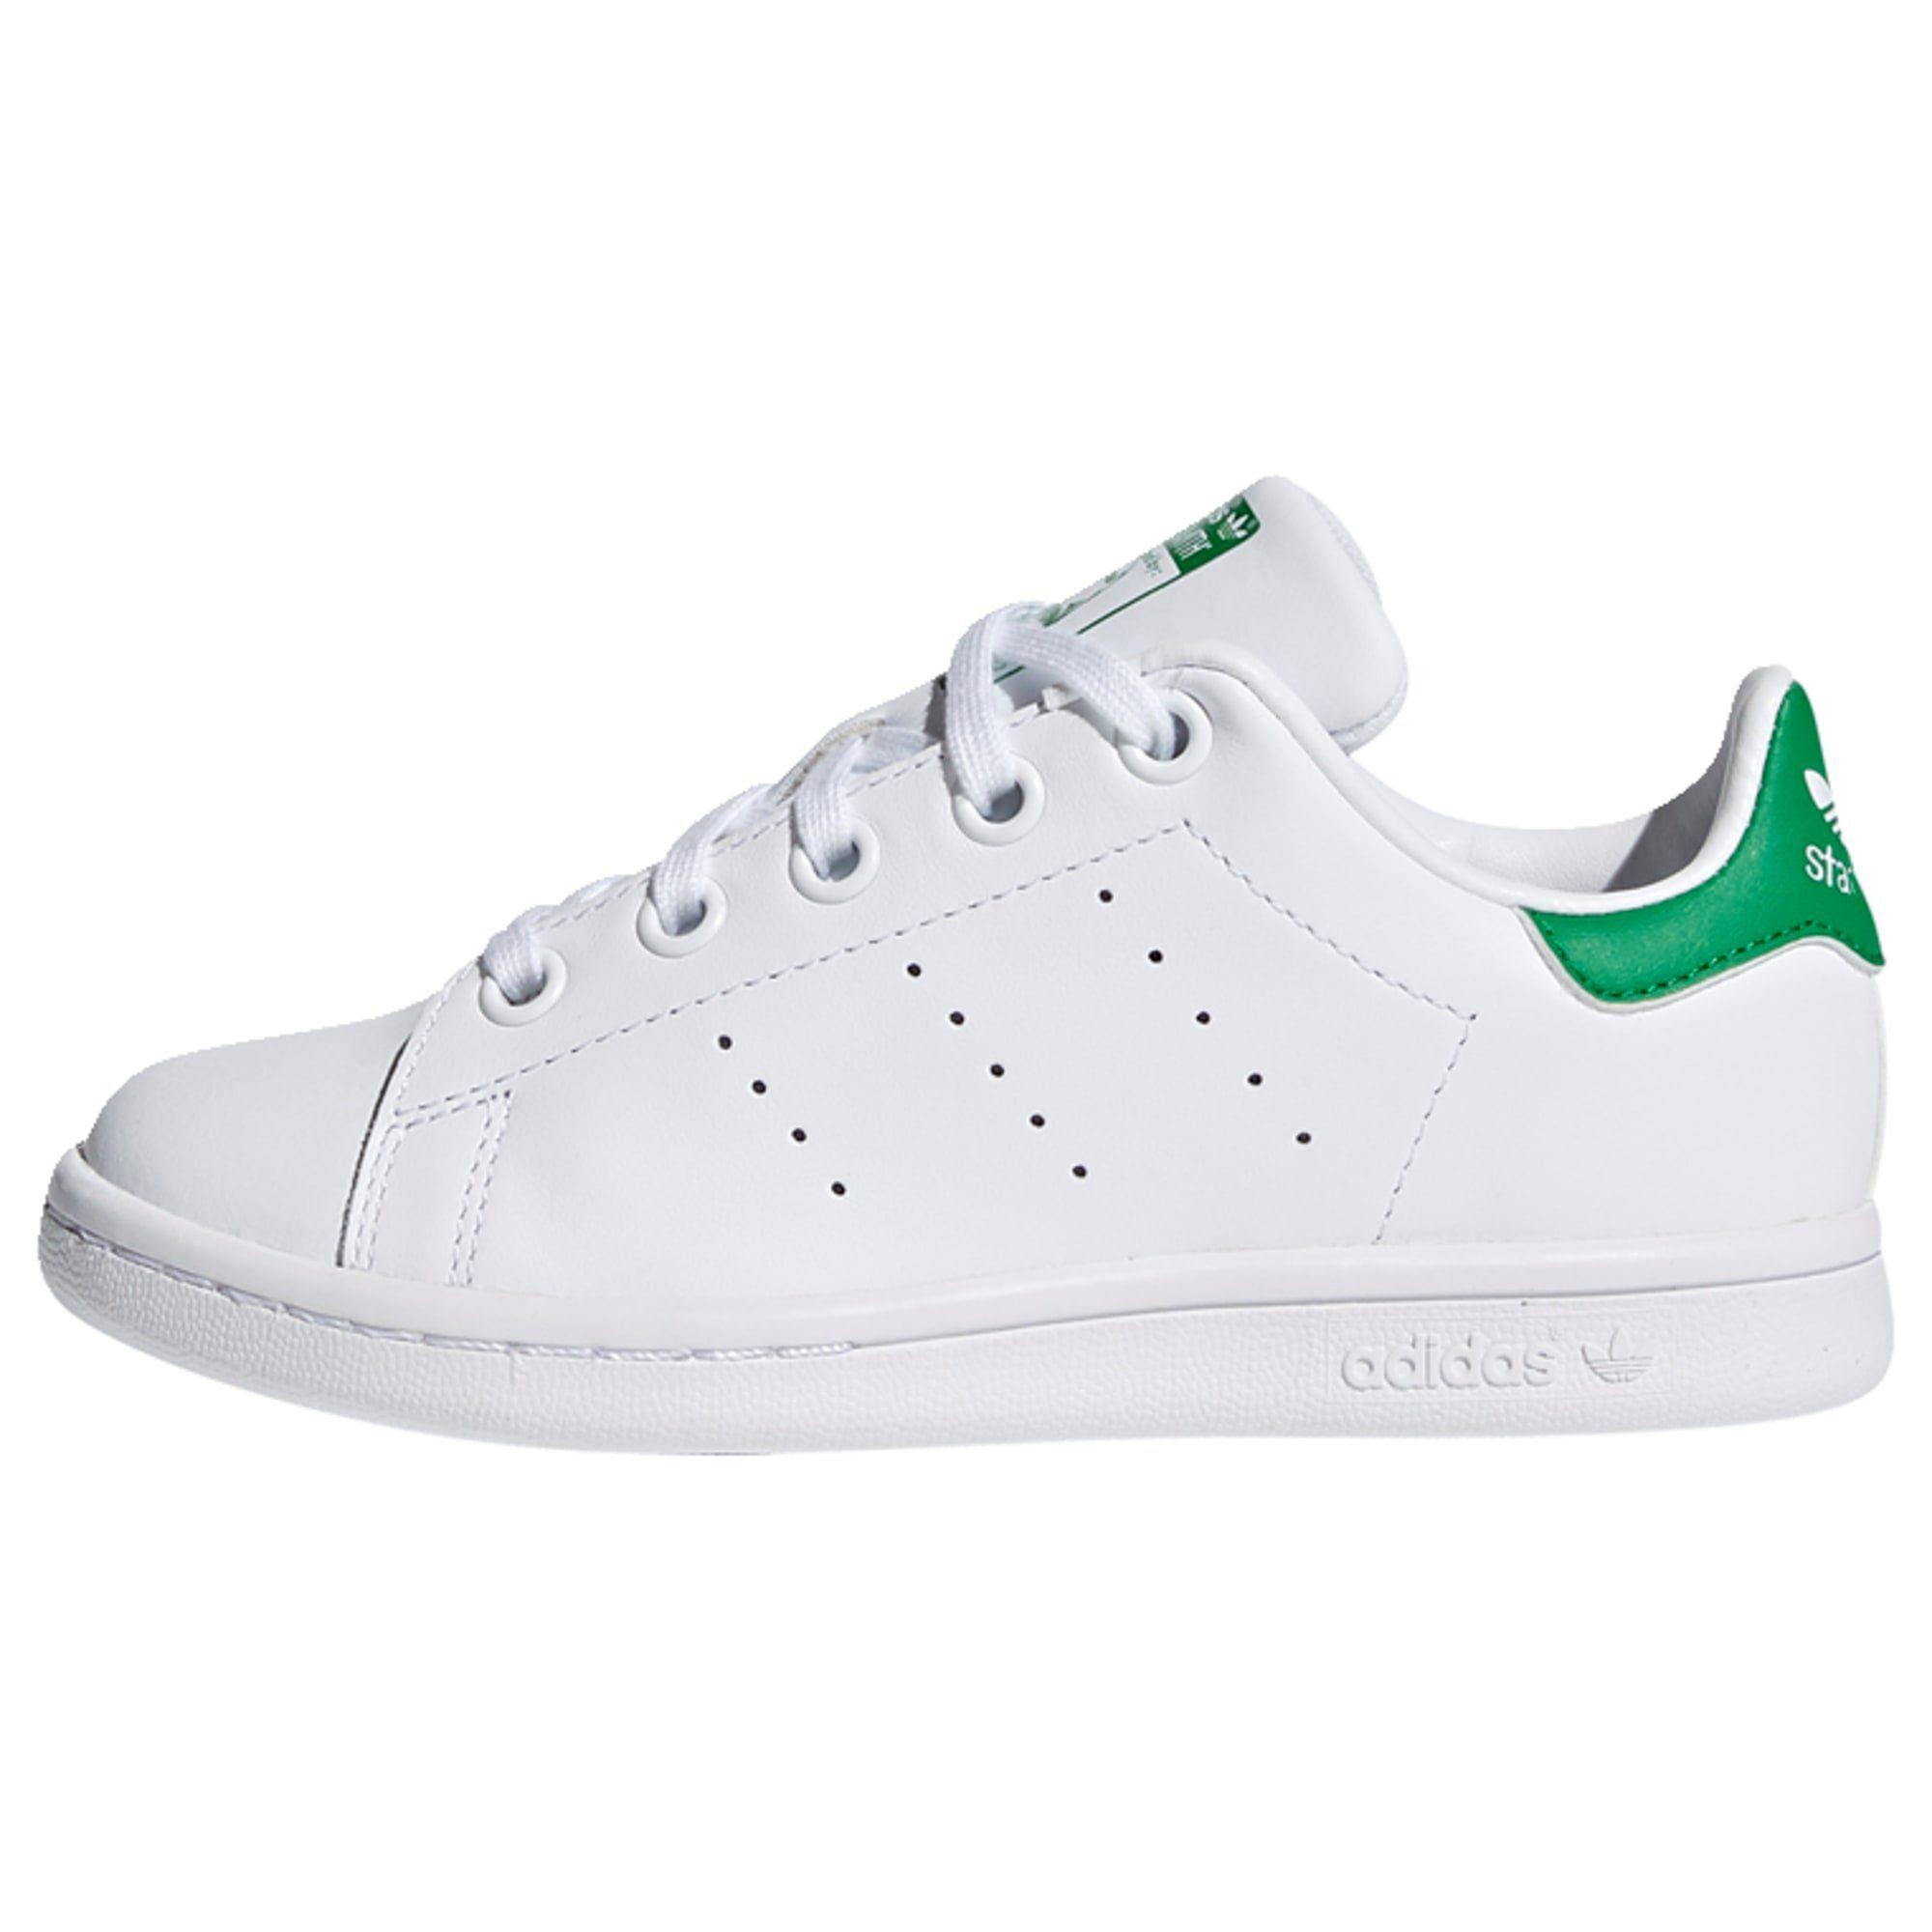 adidas Originals »Stan Smith Schuh« Sneaker Stan Smith;Klassiker online kaufen   OTTO